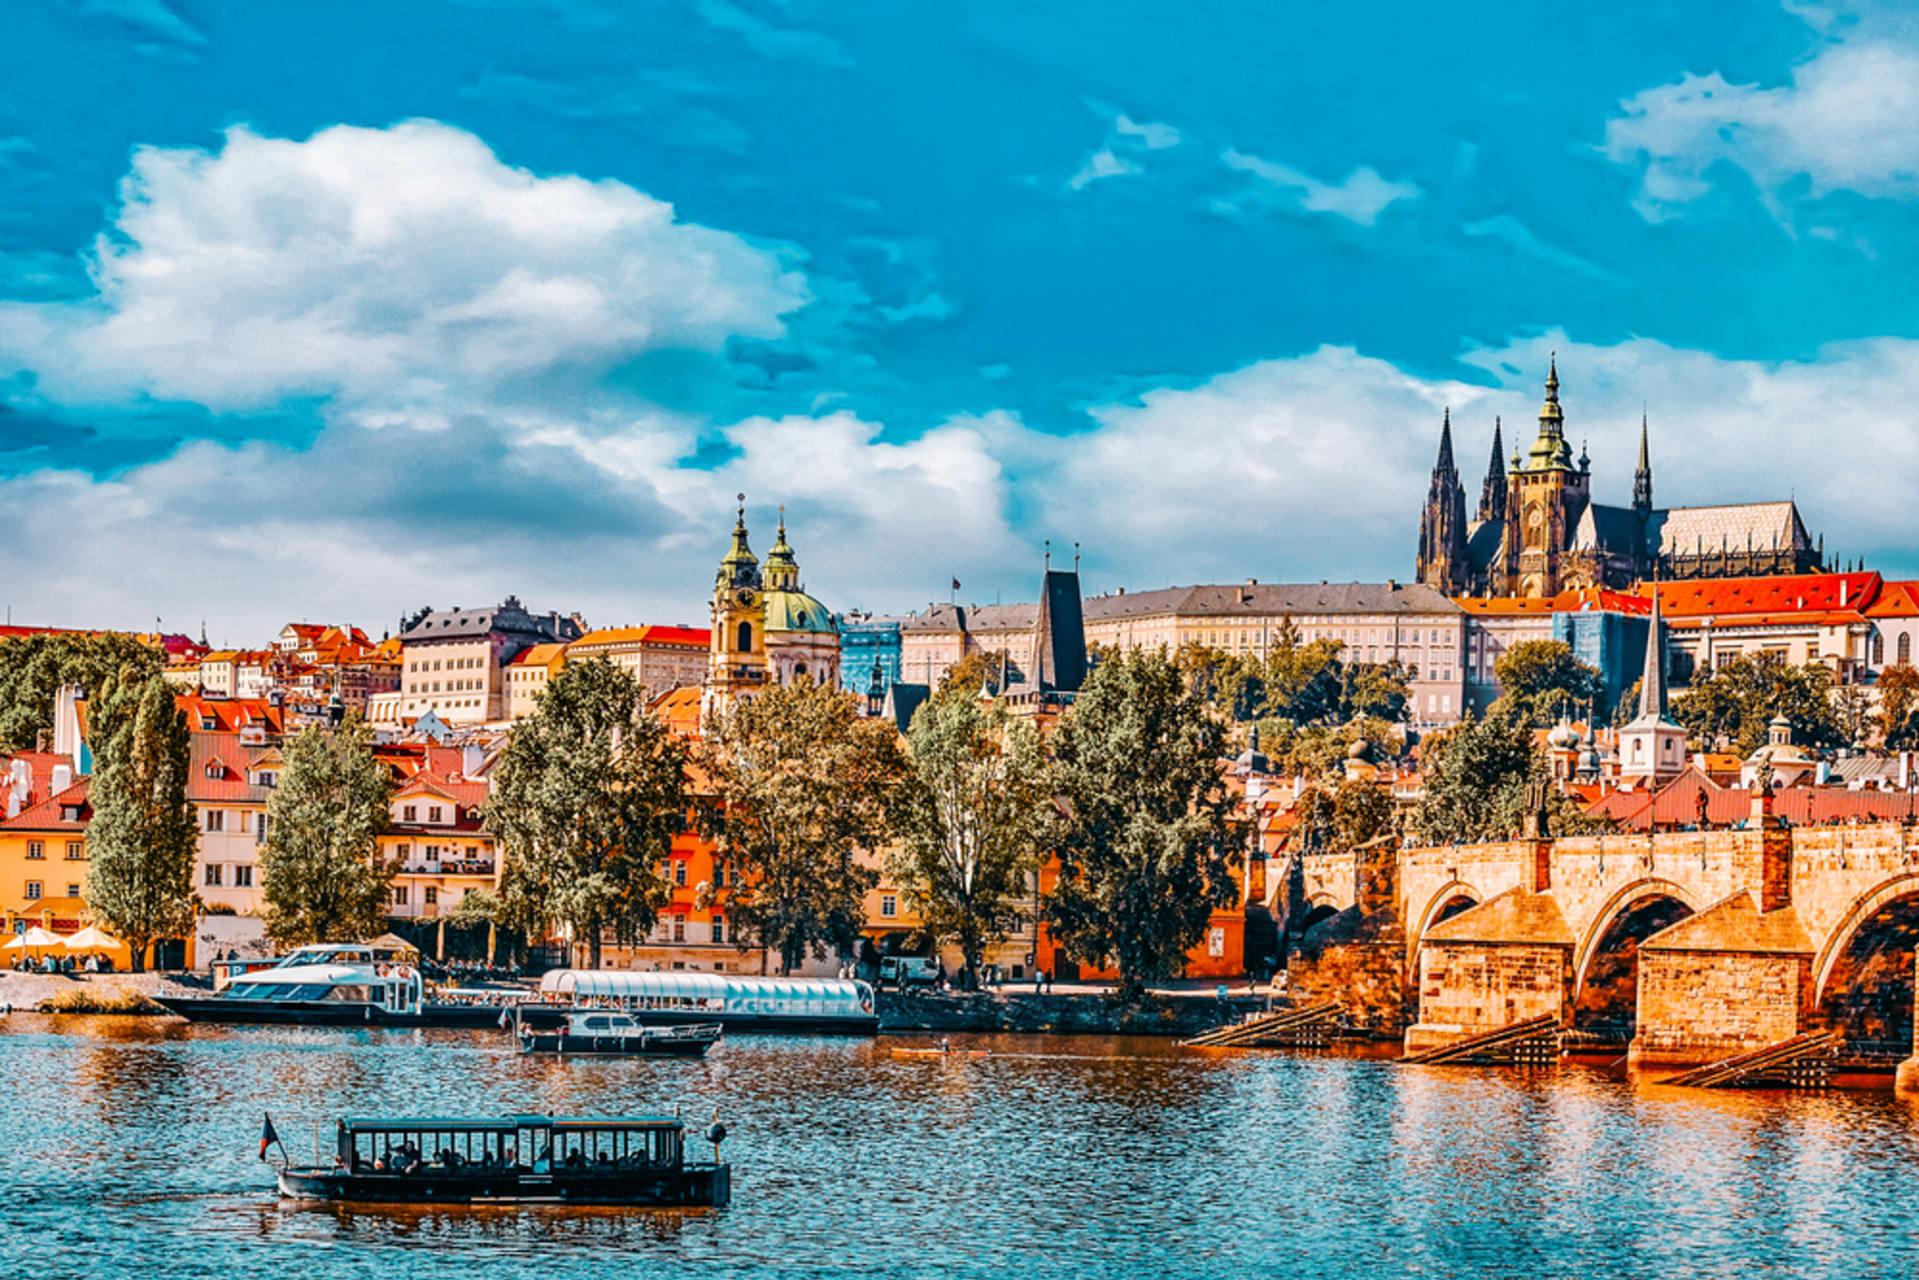 Prague - A Fathers Day Silent Walk through the Beauty of Prague